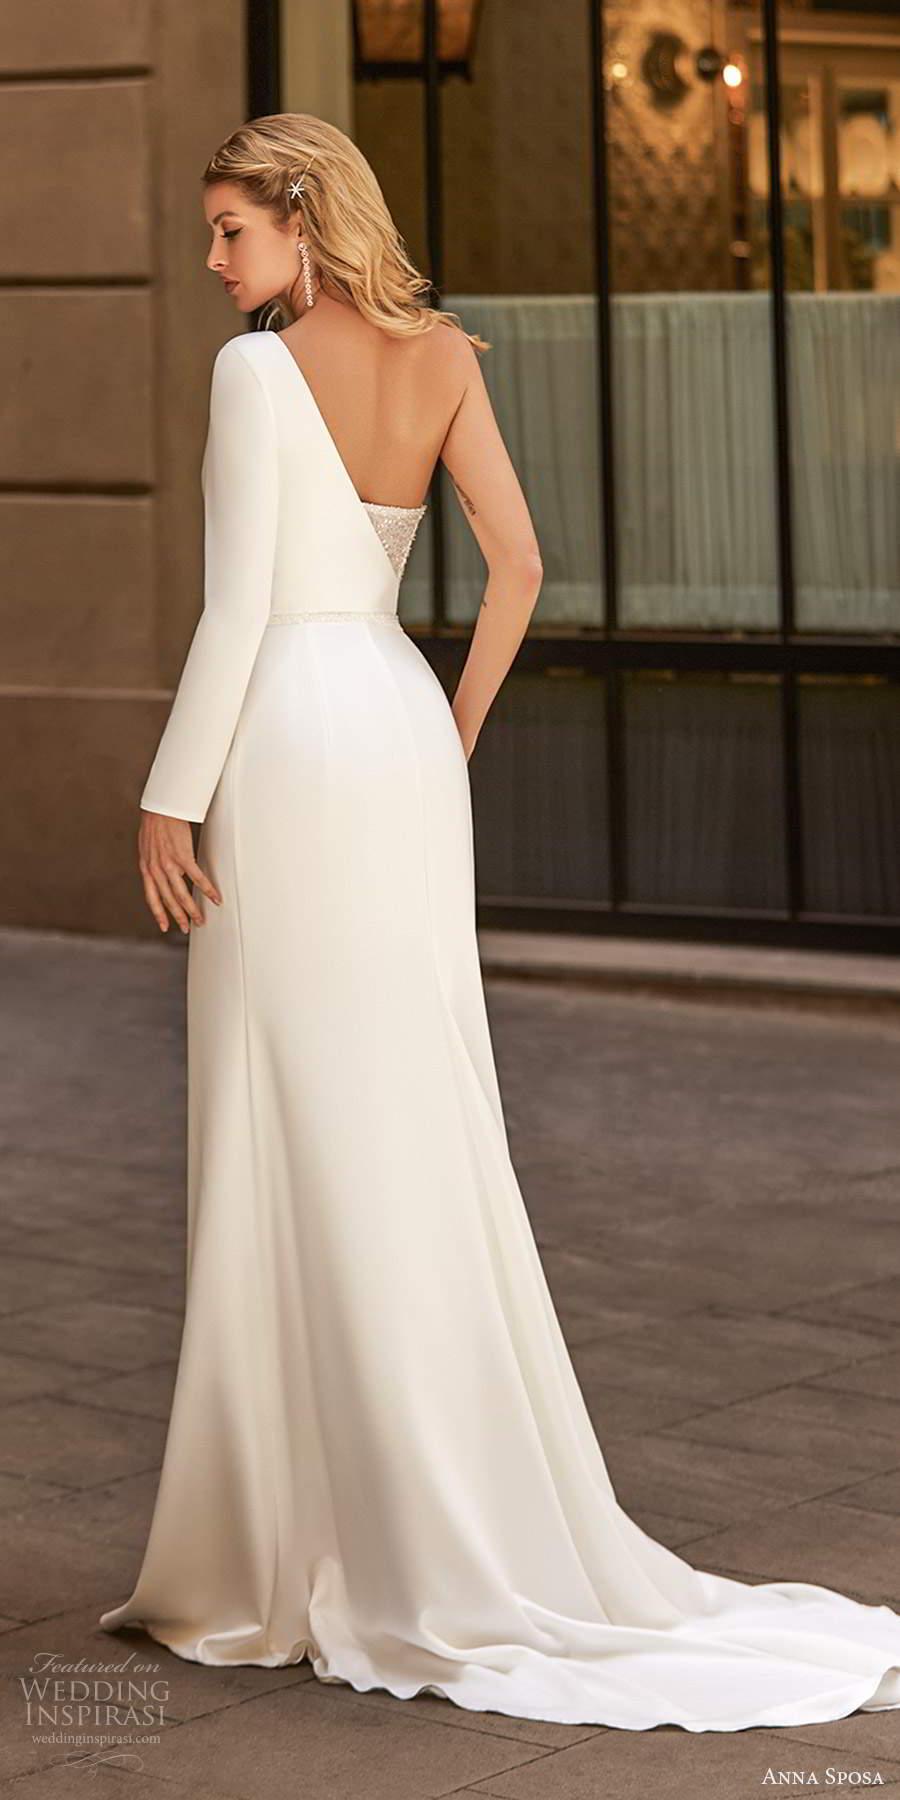 anna sposa 2021 bridal one shoulder long sleeves asymmentric sweetheart neckline embellished sheath wedding dress slit skirt  chapel train (1) bv